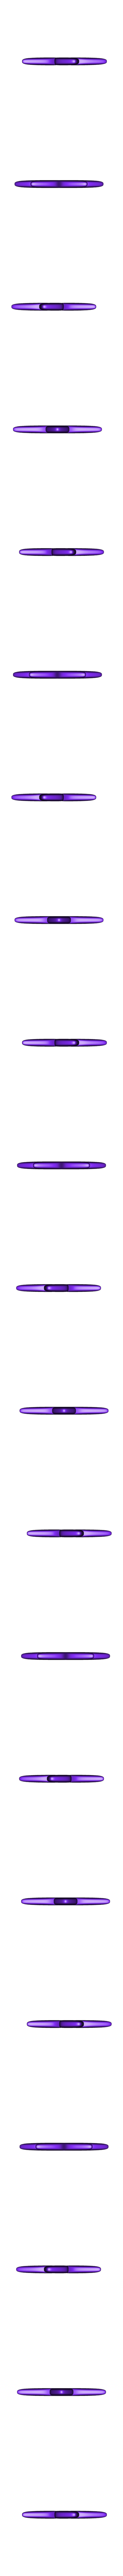 ada-spinner.stl Télécharger fichier STL gratuit Adafruit Fidget Spinner • Modèle imprimable en 3D, Adafruit